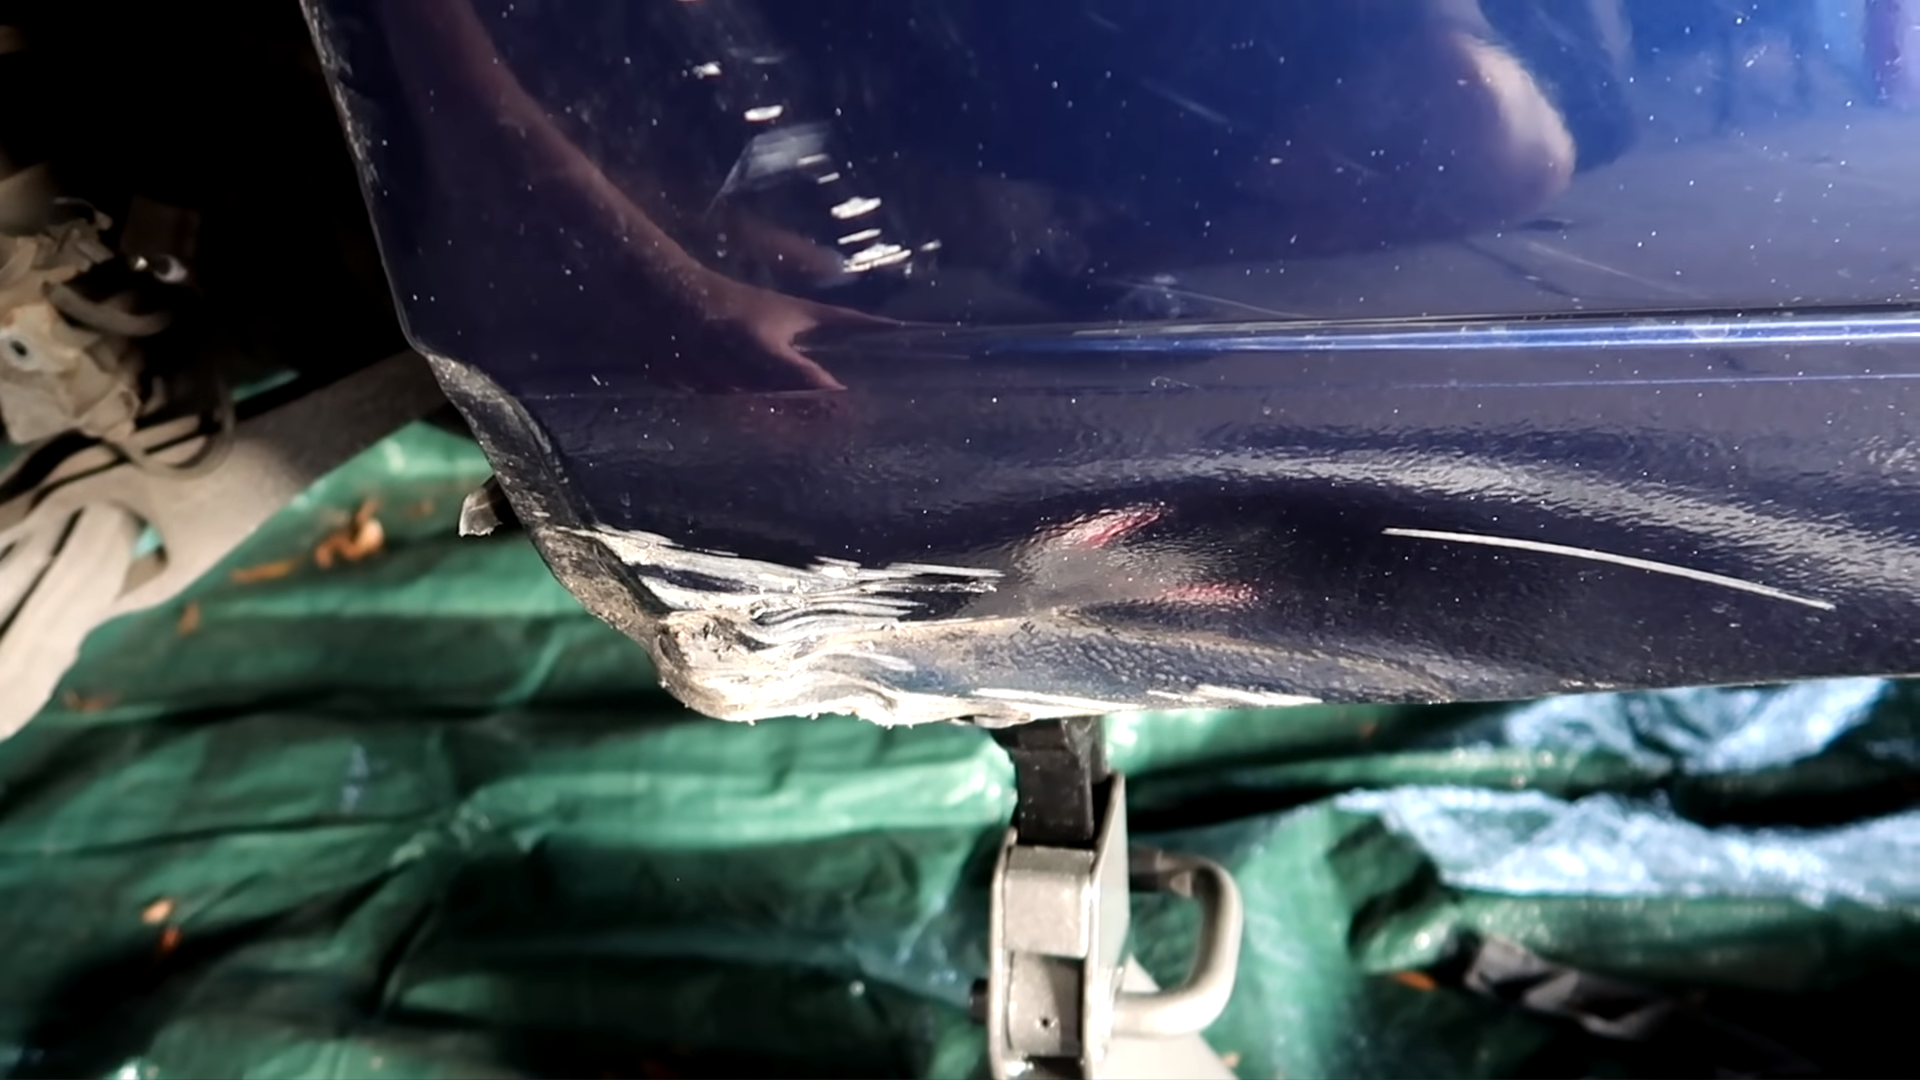 Samcrac 911 Rocker Panel Damage